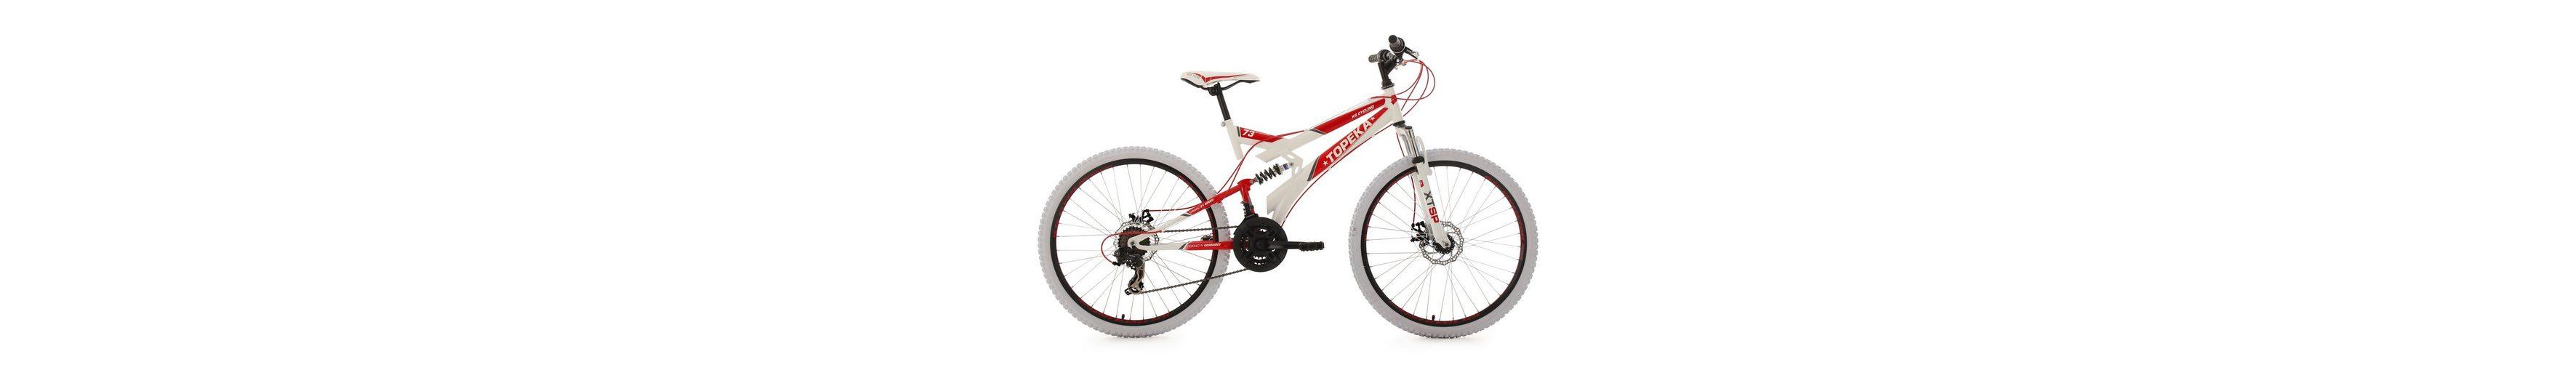 KS Cycling Fully-Mountainbike, 26 Zoll, 21 Gang-ShimanoTourney Kettenschaltung, »Topeka«